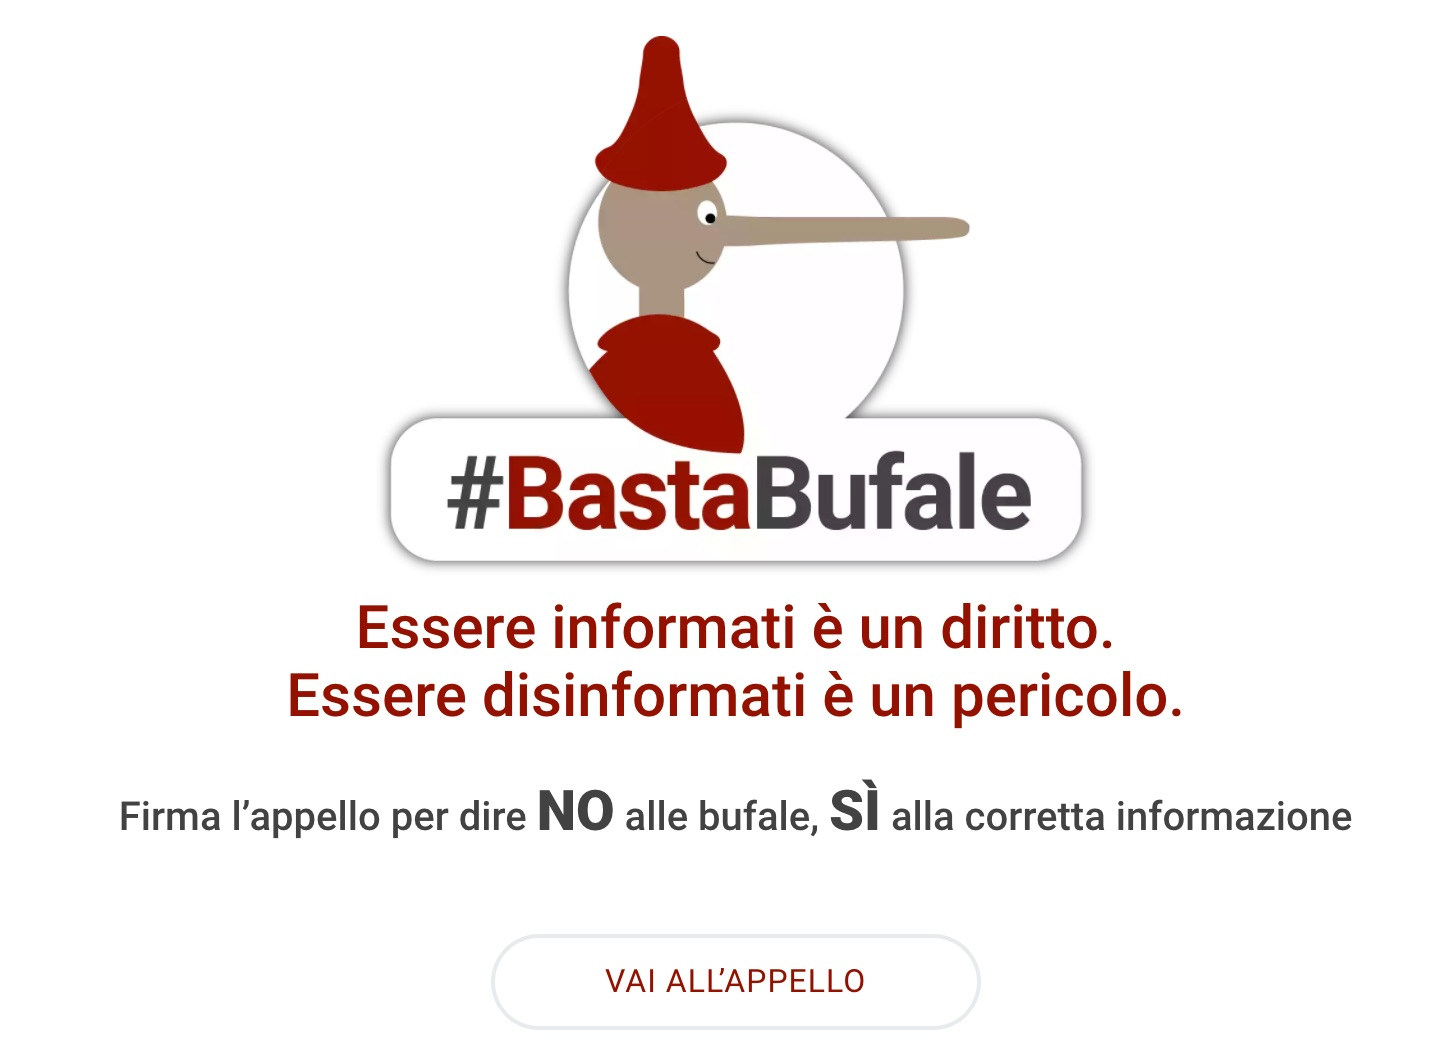 Boldrini contro fake news